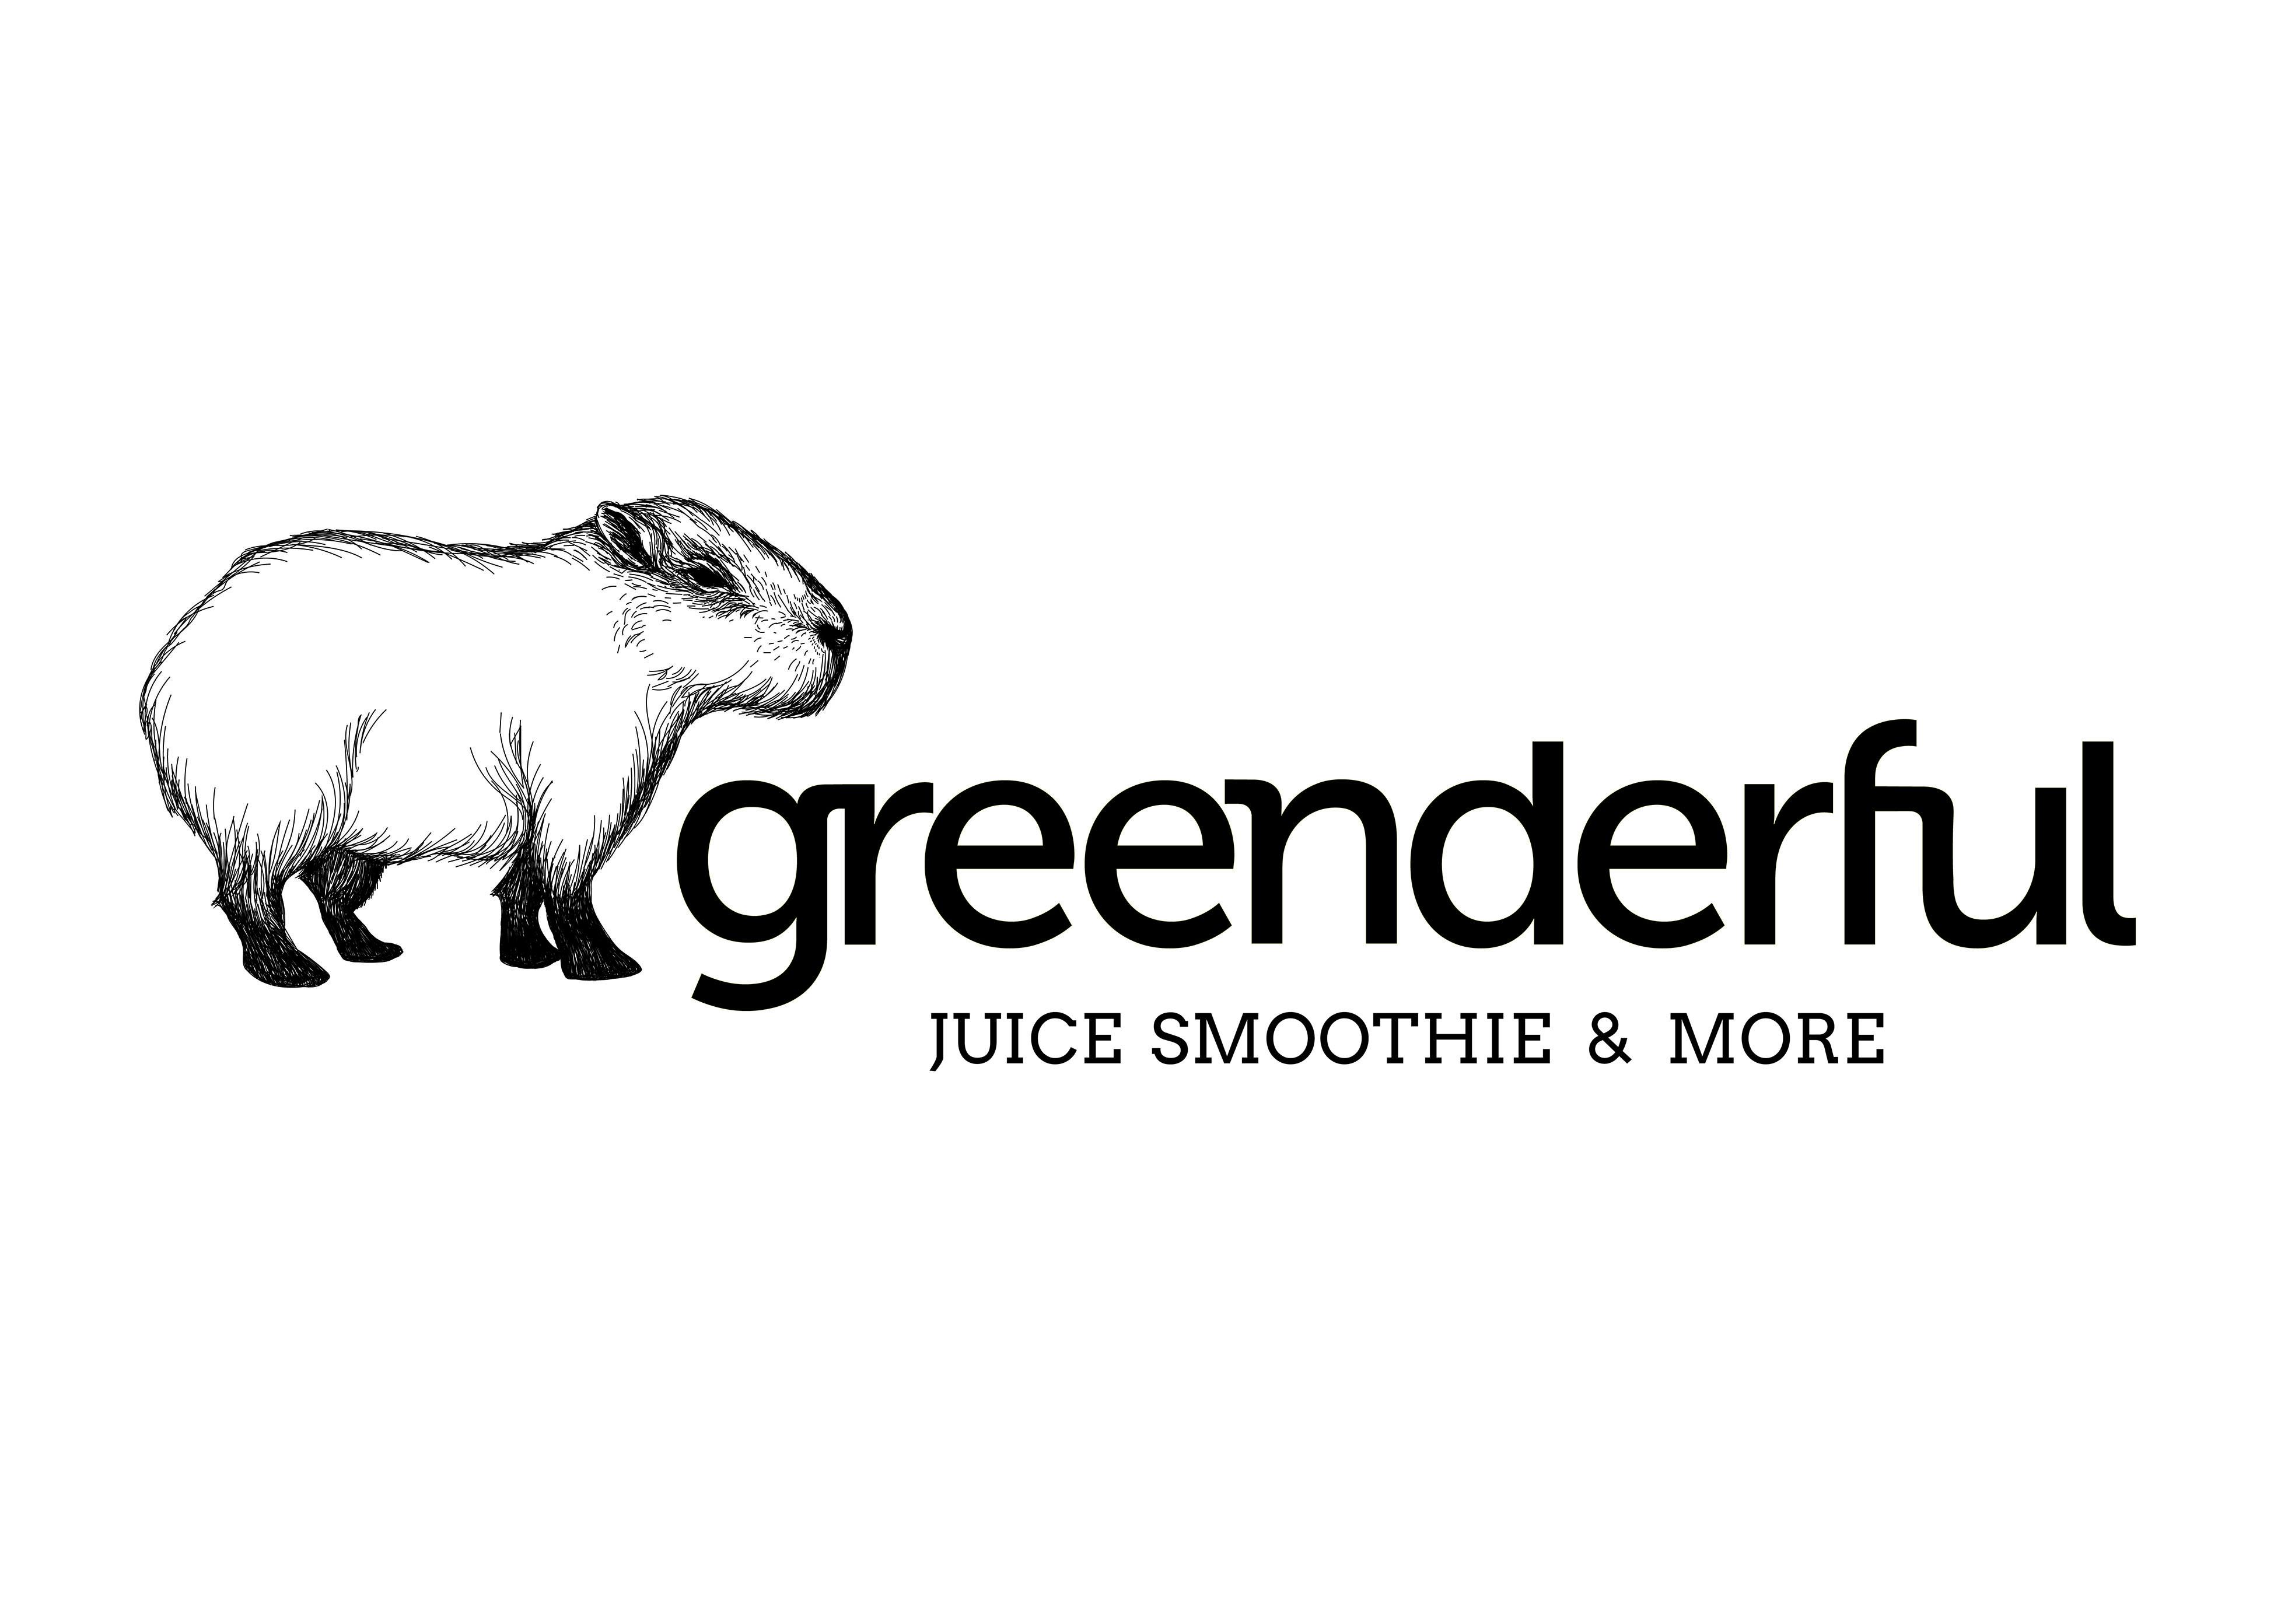 Greenderful Logo Design